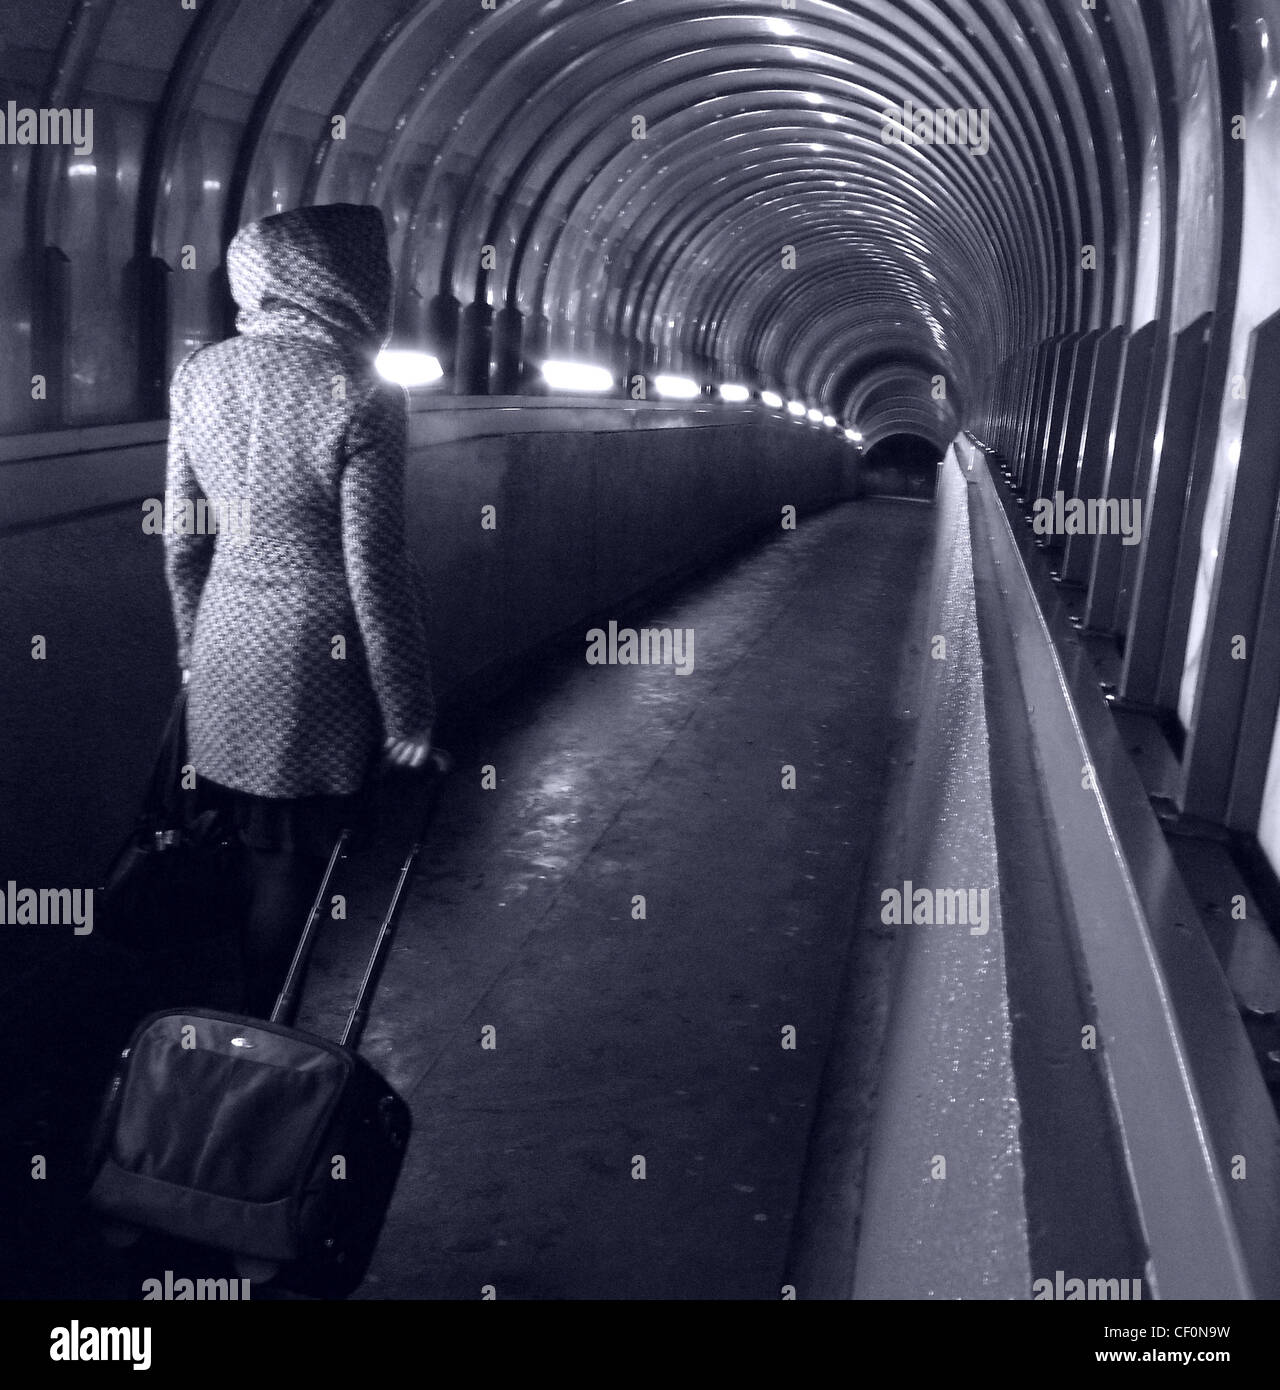 walker,at,Park,lane,Darlington,Passenger,Tunnel,with,luggage,Darlington,Station,Darlington,Teeside,England,UK,gotonysmith,british,lone,woman,female,lady,girl,bag,on,wheels,laptop,bag,suitcase,walk,walking,wheeling,vanishing,point,dark,night,evening,lights,cold spiral,gotonysmith,Buy Pictures of,Buy Images Of